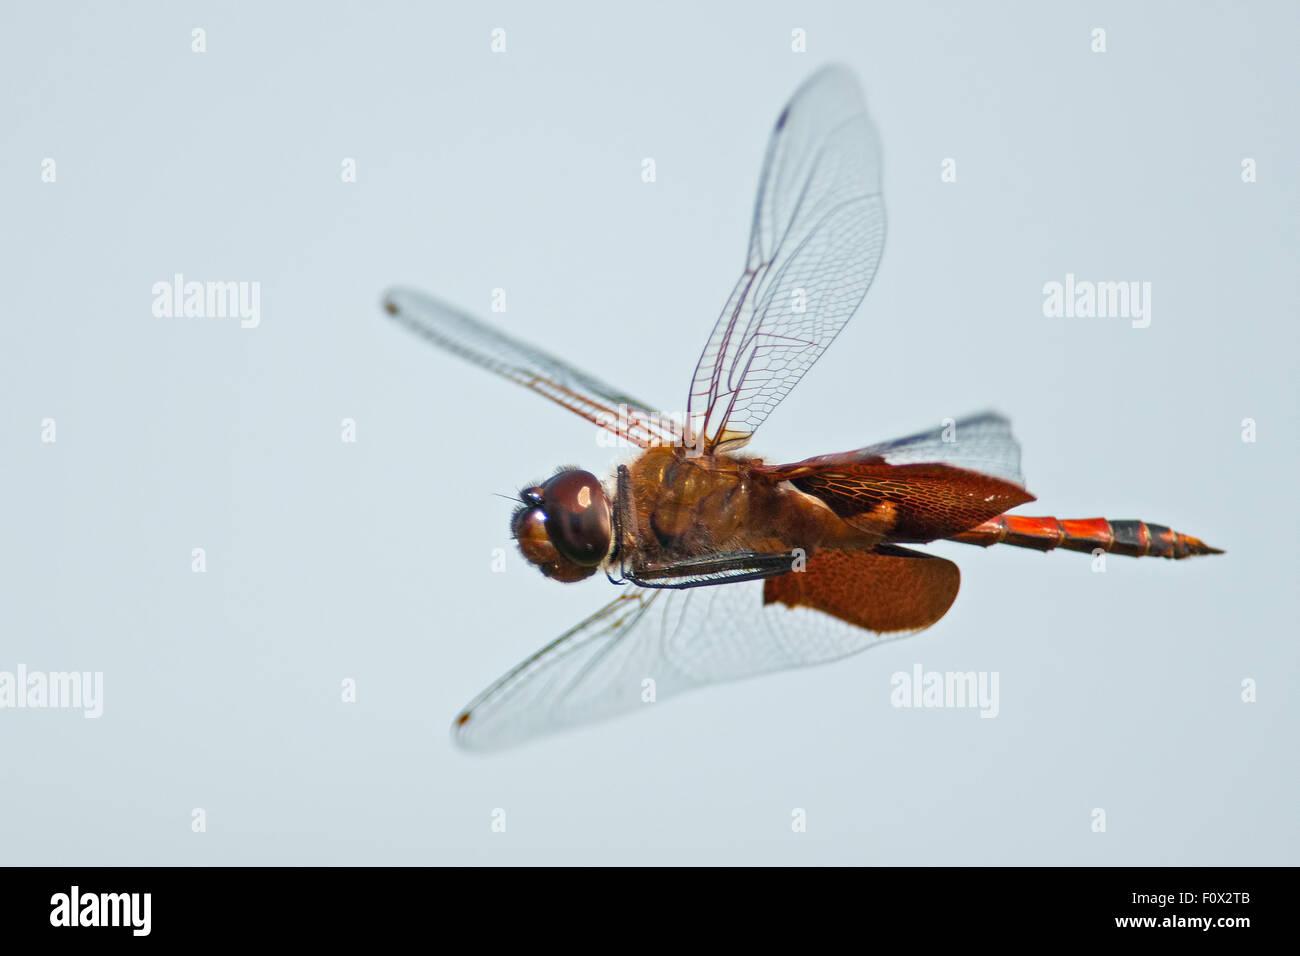 Carolina Saddlebags Dragonfly in Flight - Stock Image